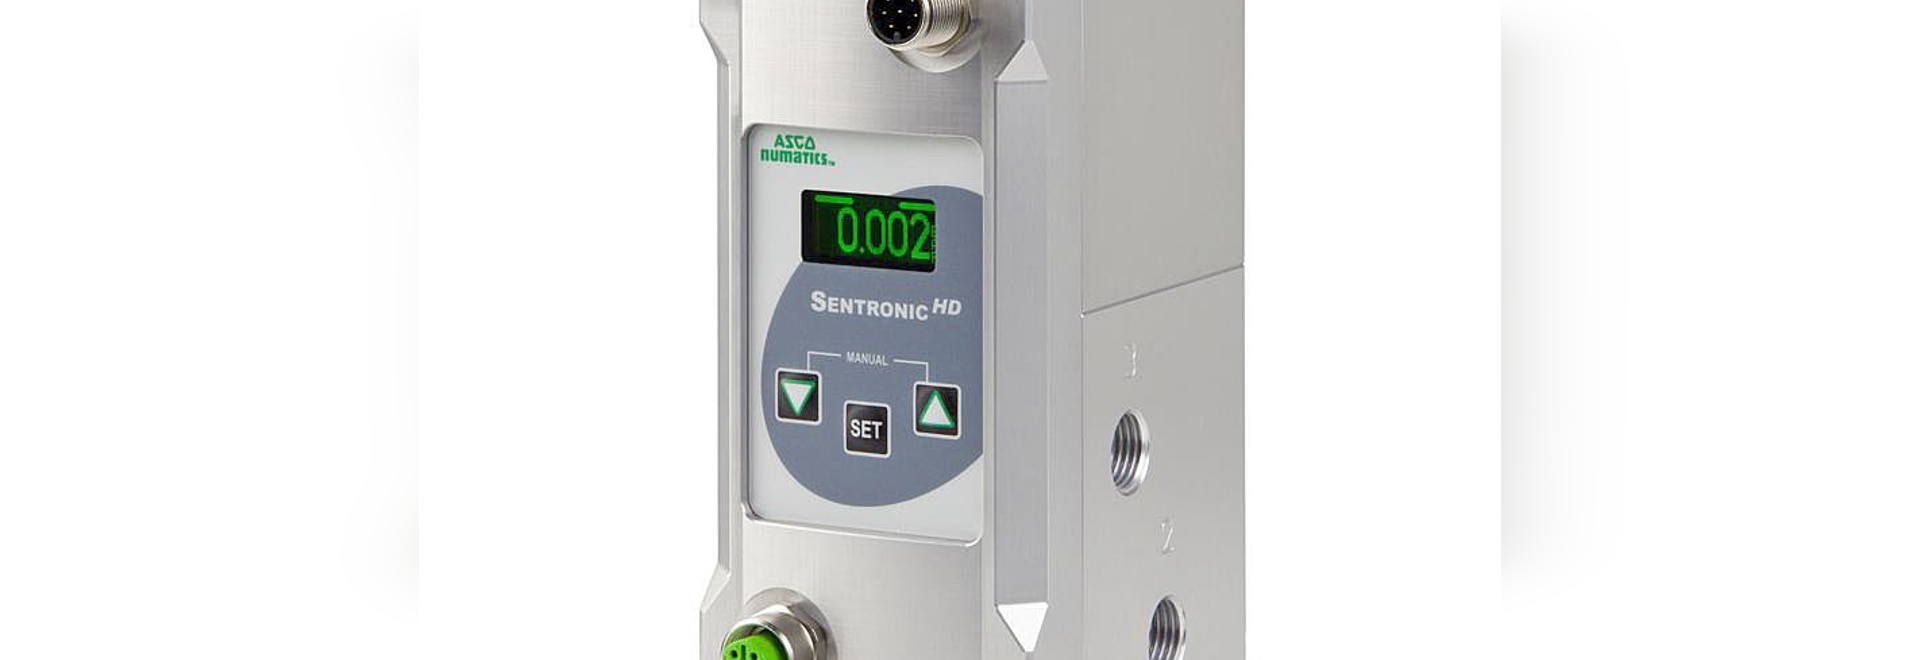 ASCO Numatics Launches Sentronic HD